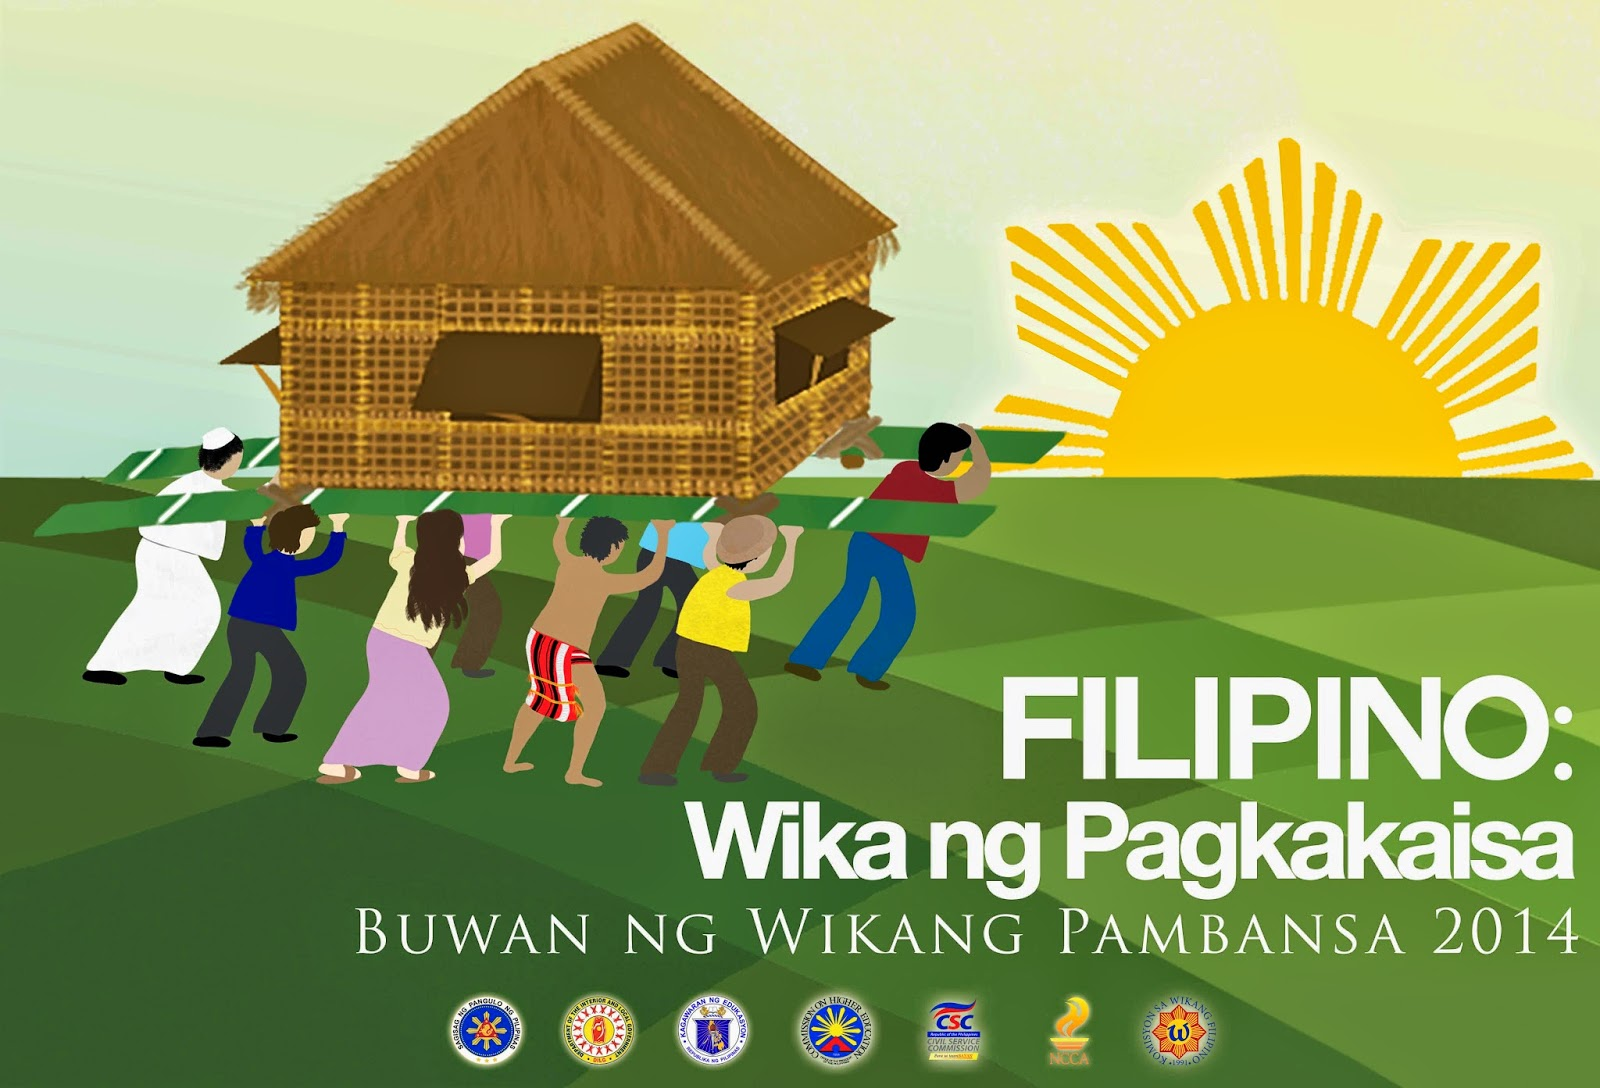 buwan ng wika Biggest collection of buwan ng wika slogans choose over 70+ slogans about buwan ng wika you can create your own slogan too easy and free.